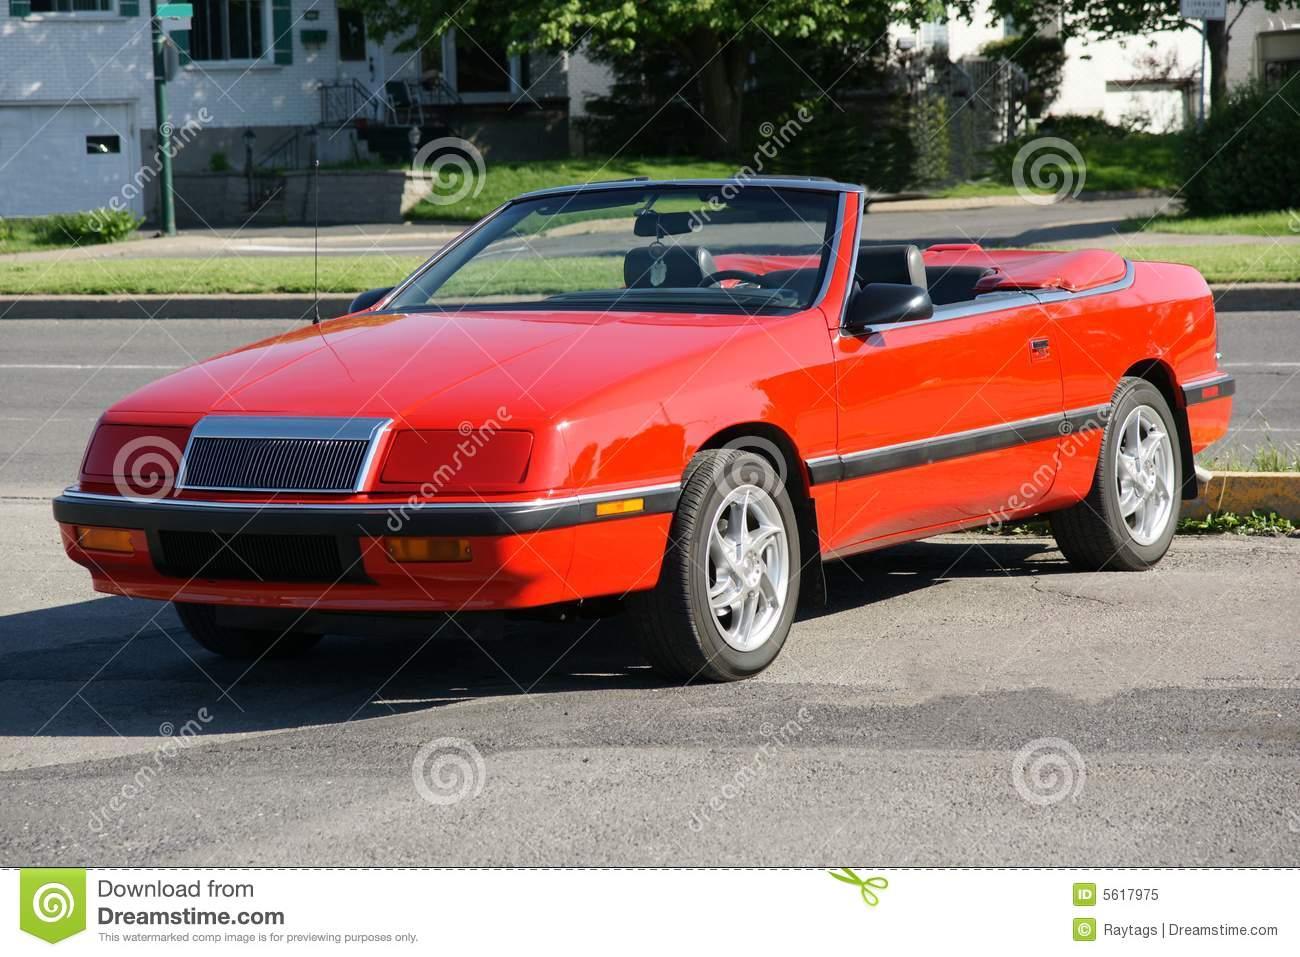 Chrysler Lebaron Convertible Royalty Free Stock Photo.